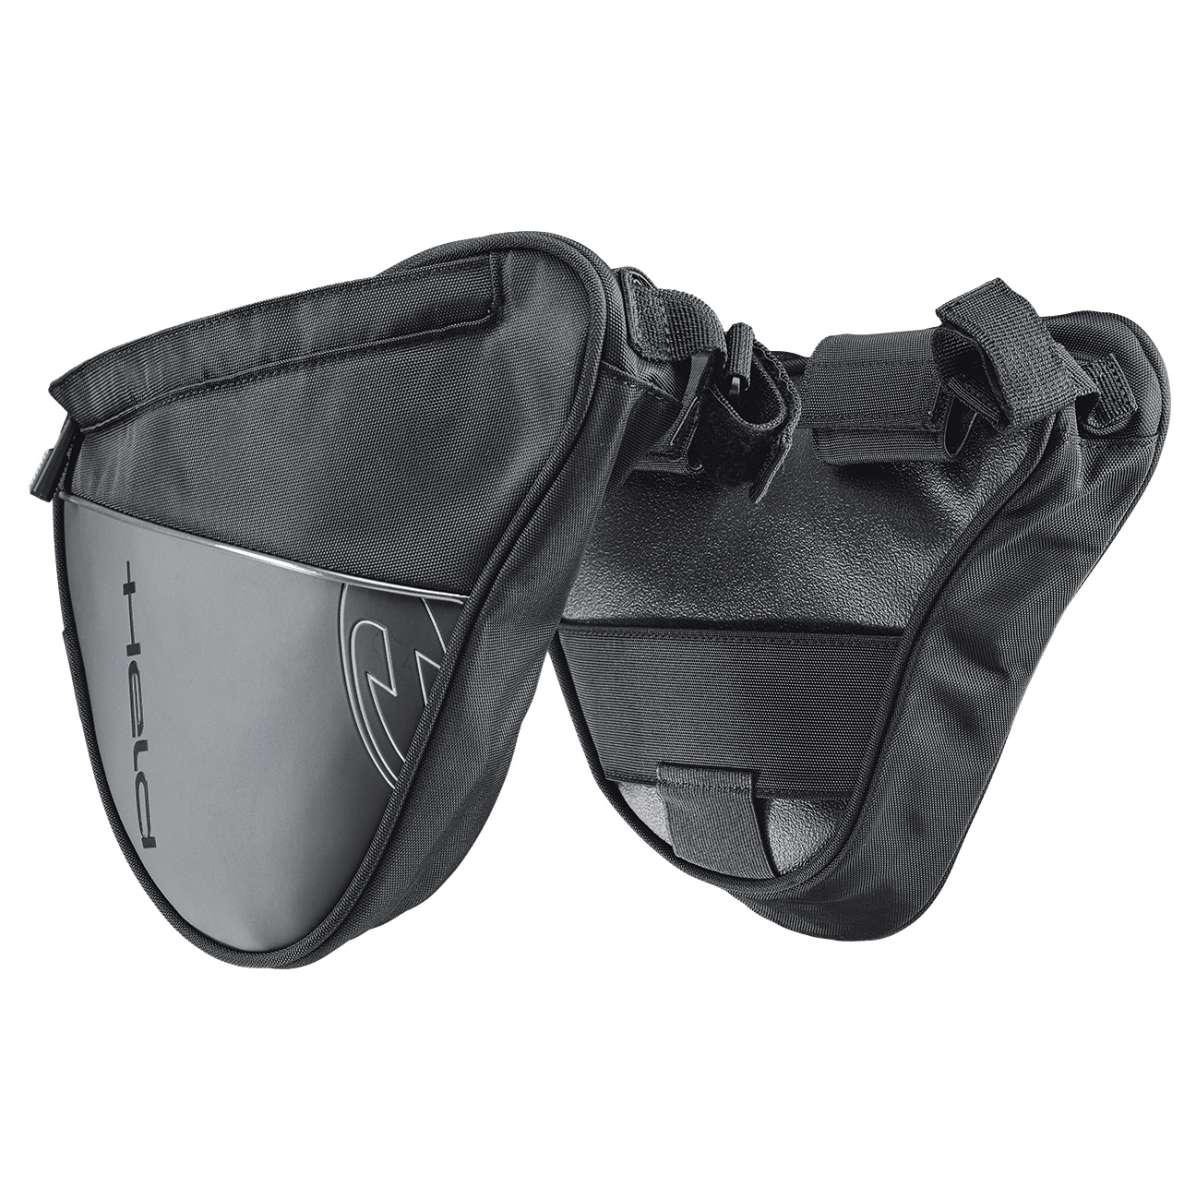 held crash bar bags tasche f r sturzb gel schwarz cs. Black Bedroom Furniture Sets. Home Design Ideas